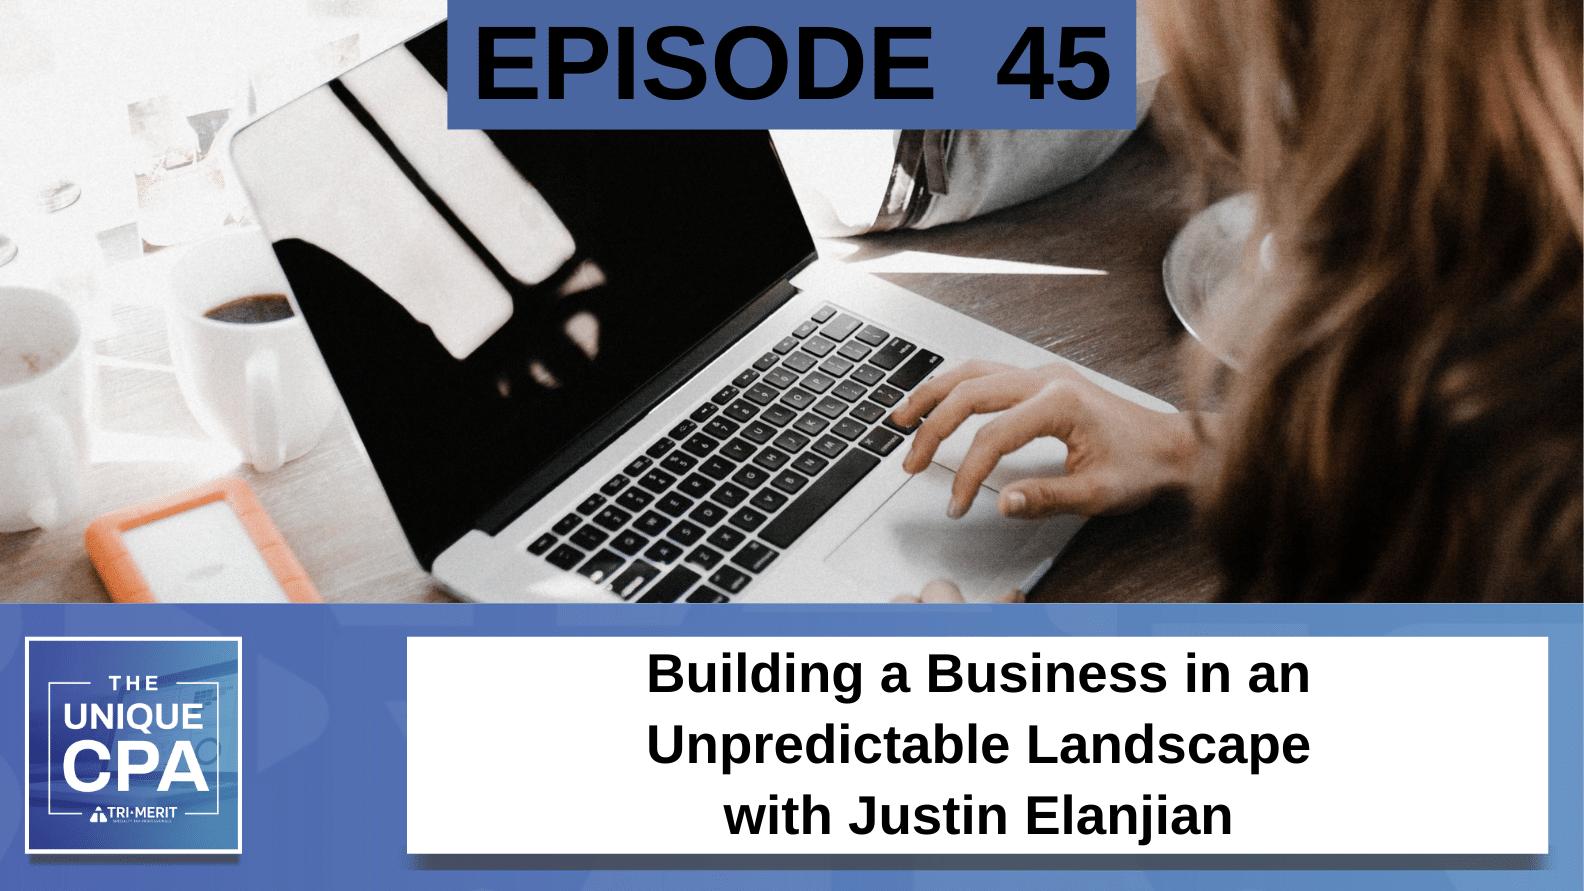 Unique CPA Featured Image Ep 45 Justin Elanjian - Building a Business in an Unpredictable Landscape - Tri-Merit